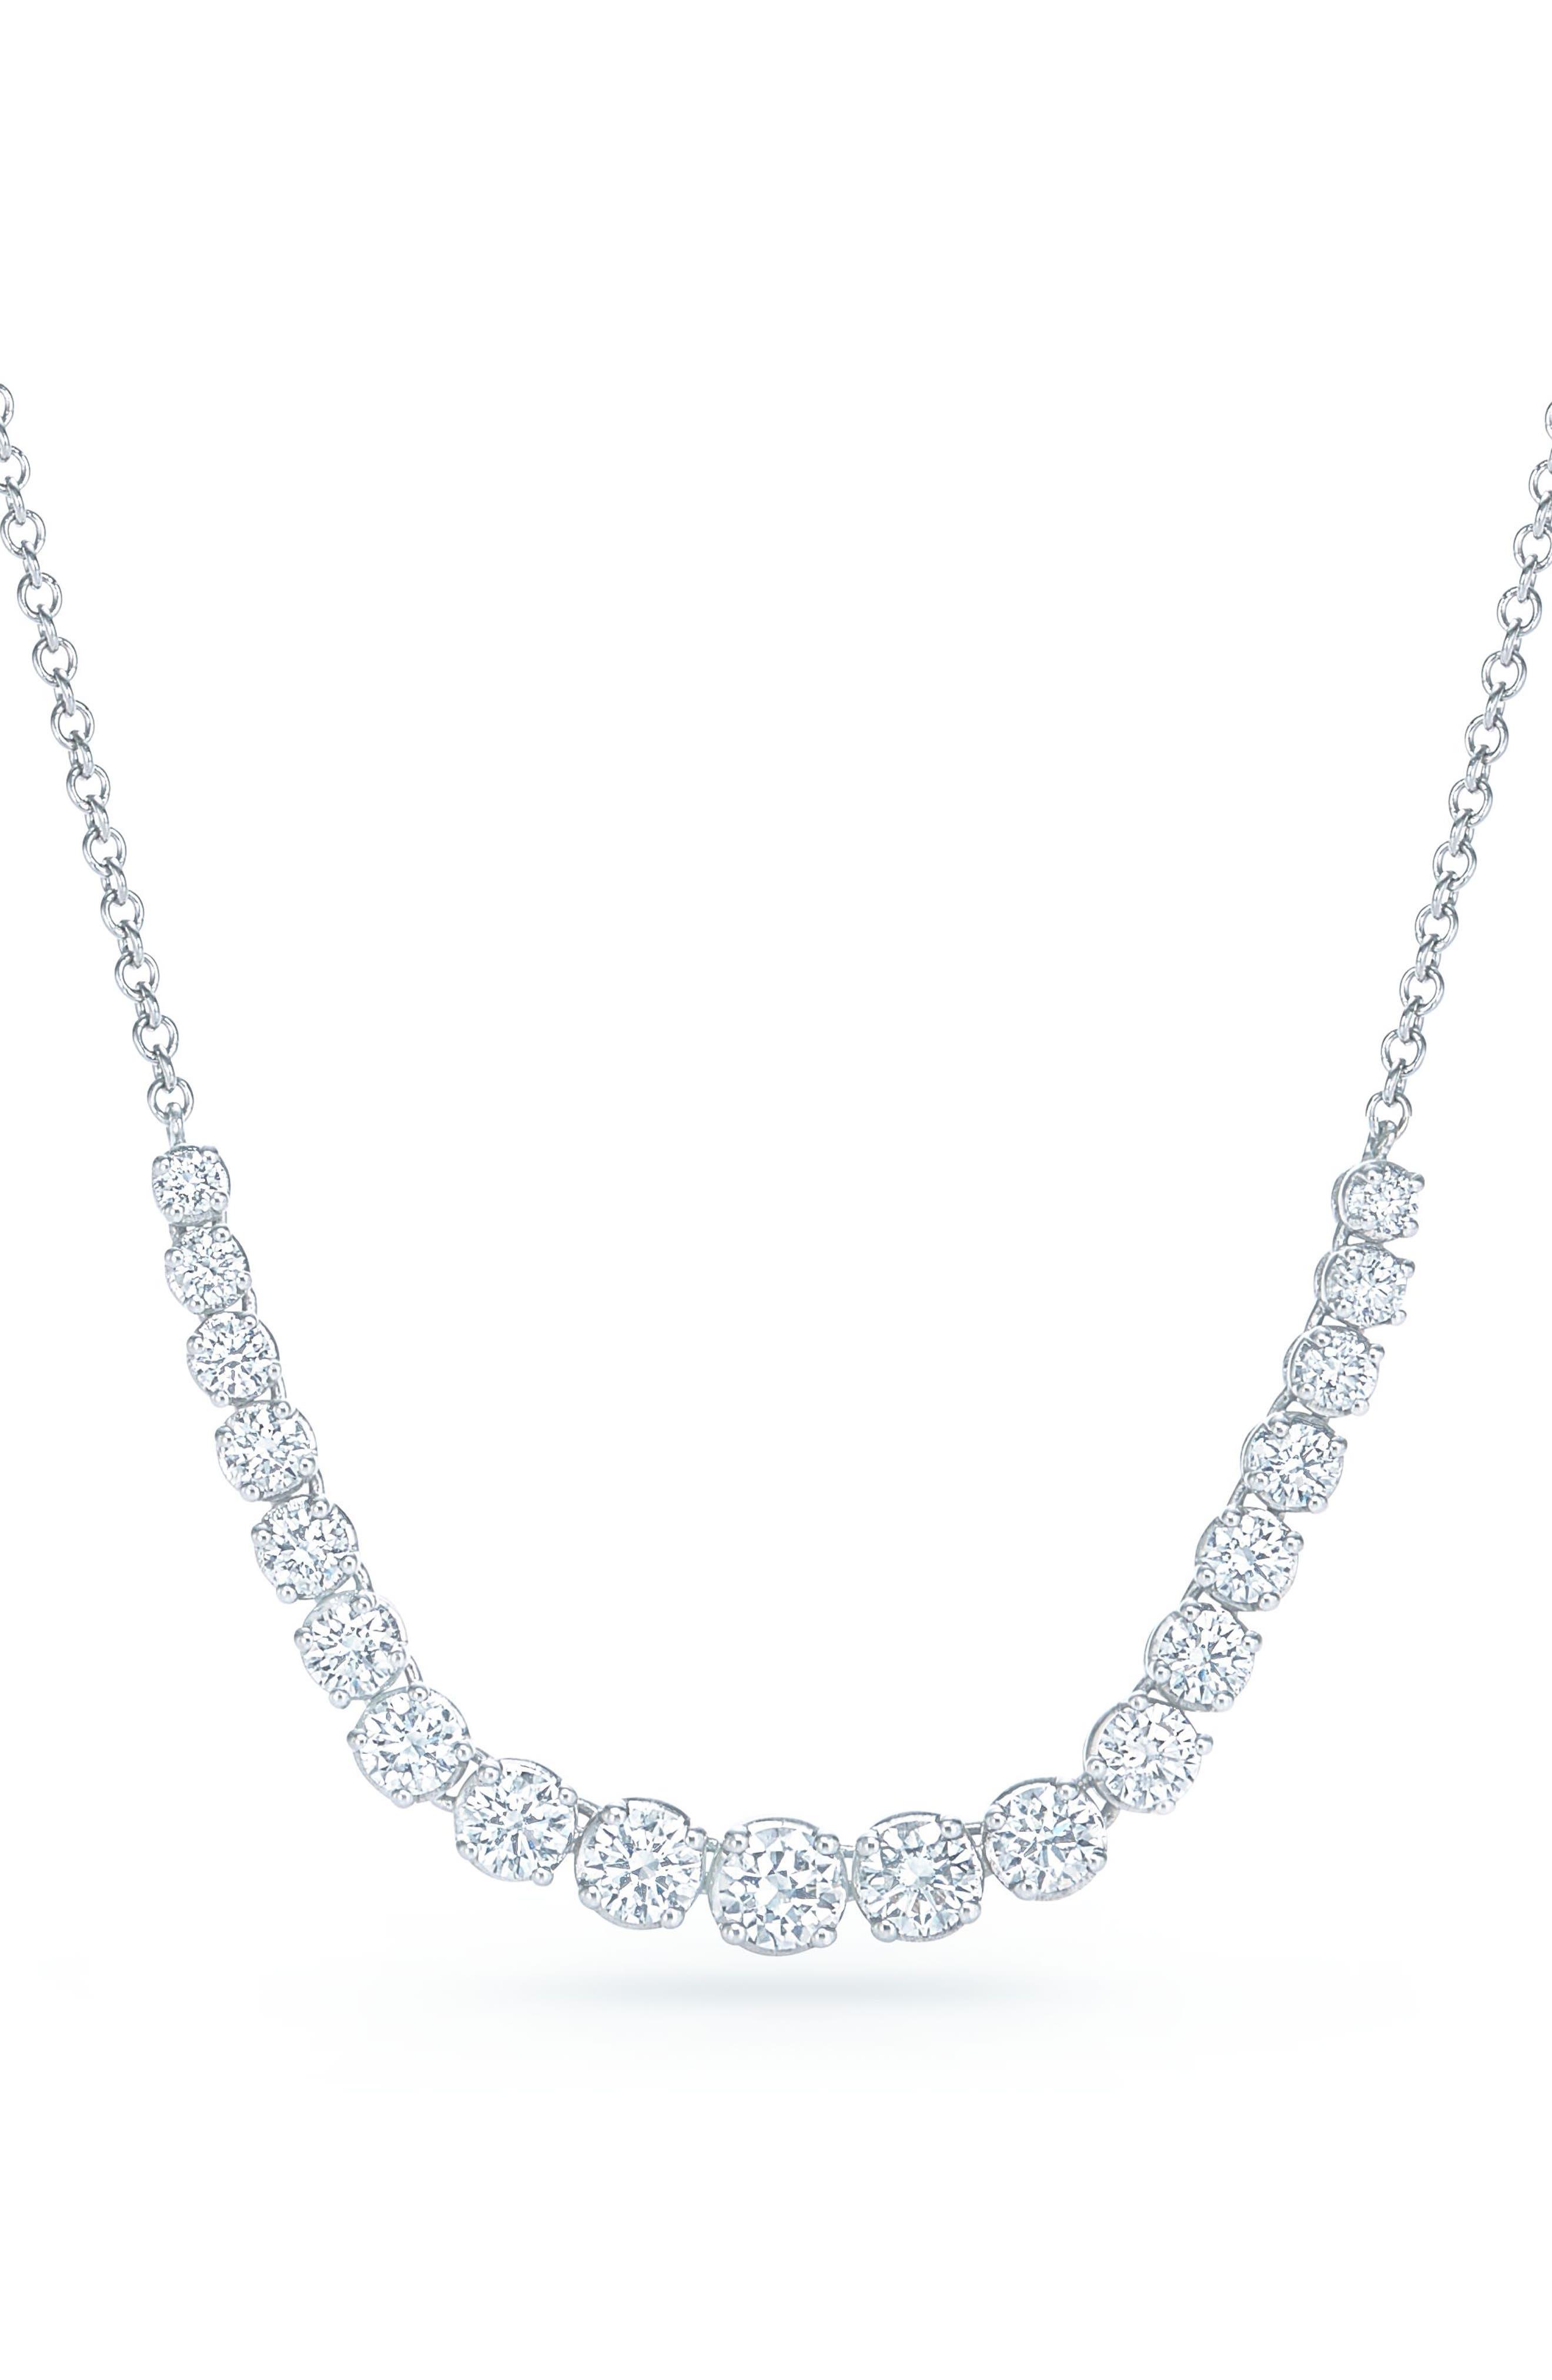 Riviera Diamond Pendant Necklace,                             Main thumbnail 1, color,                             White Gold